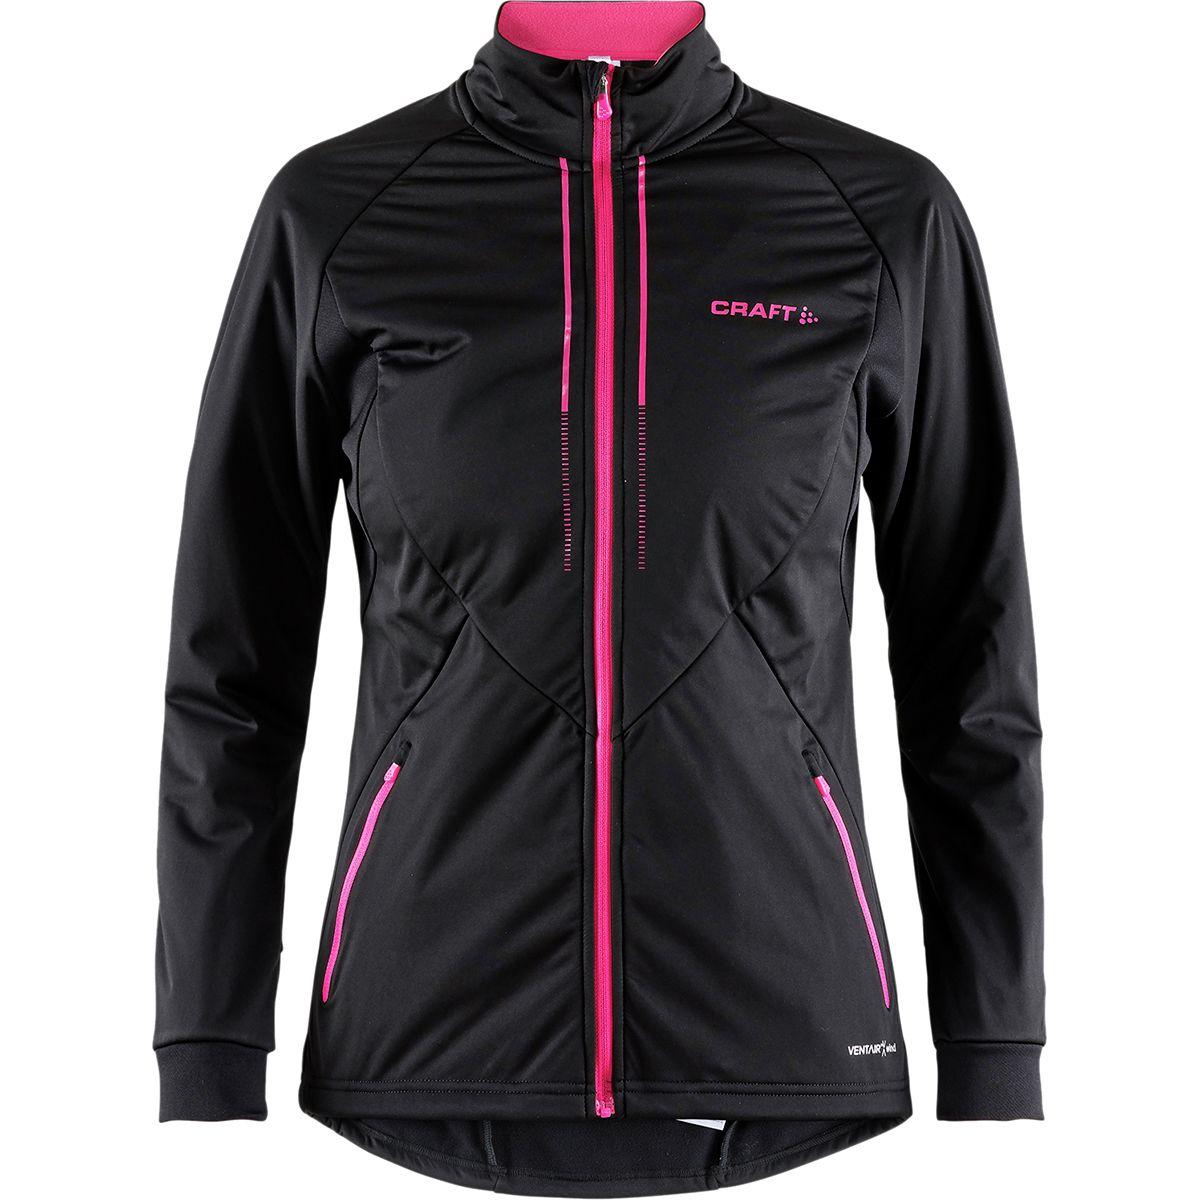 Craft Storm Jacket 2.0 - Women's